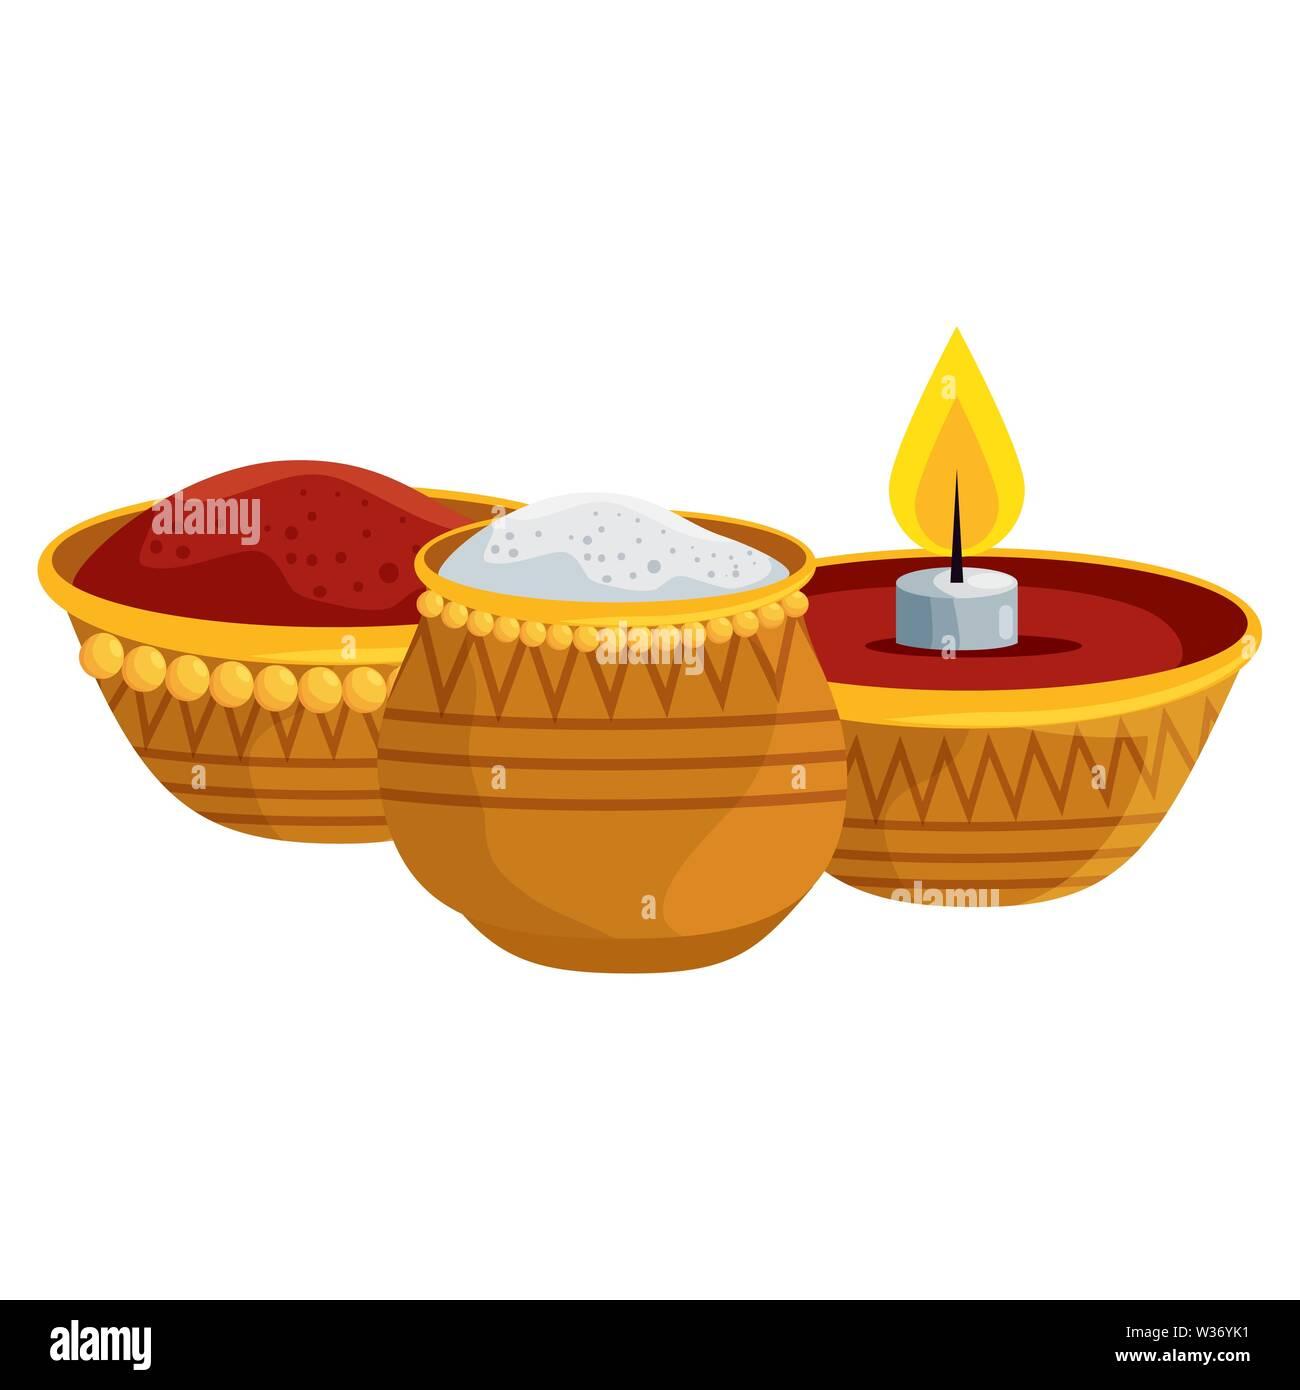 Ramadan Kareem Kerze und Essen traditionelle Symbole Stockbild